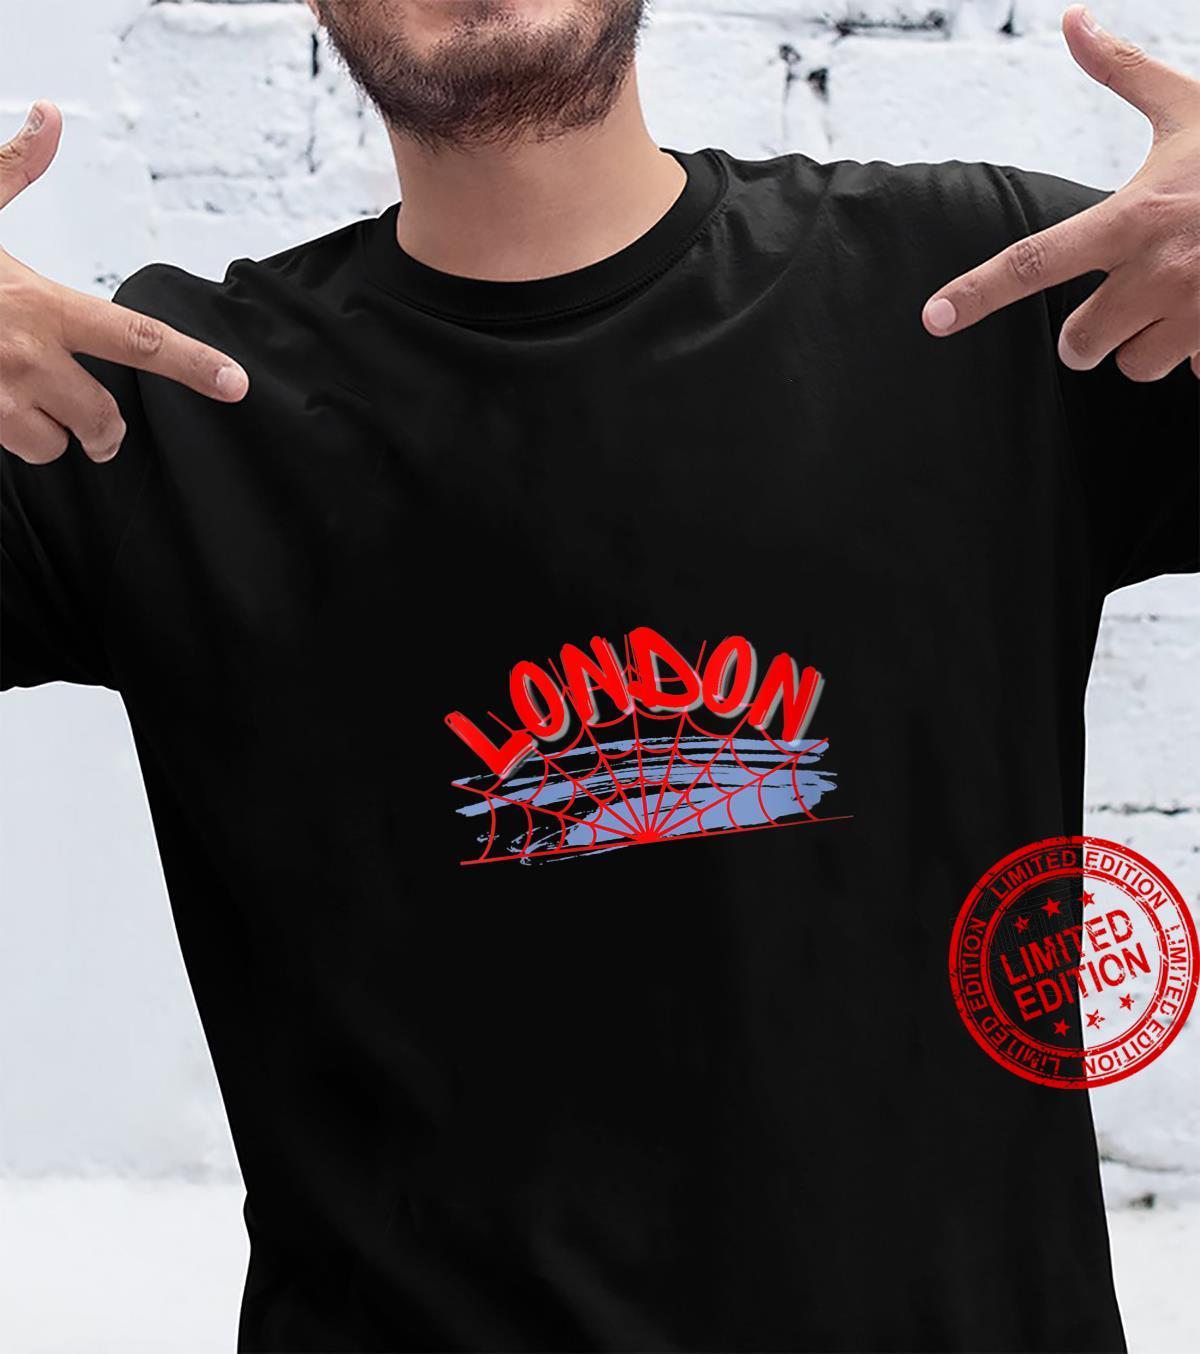 Roadworking London England Spider Web Travel Tourist Shirt